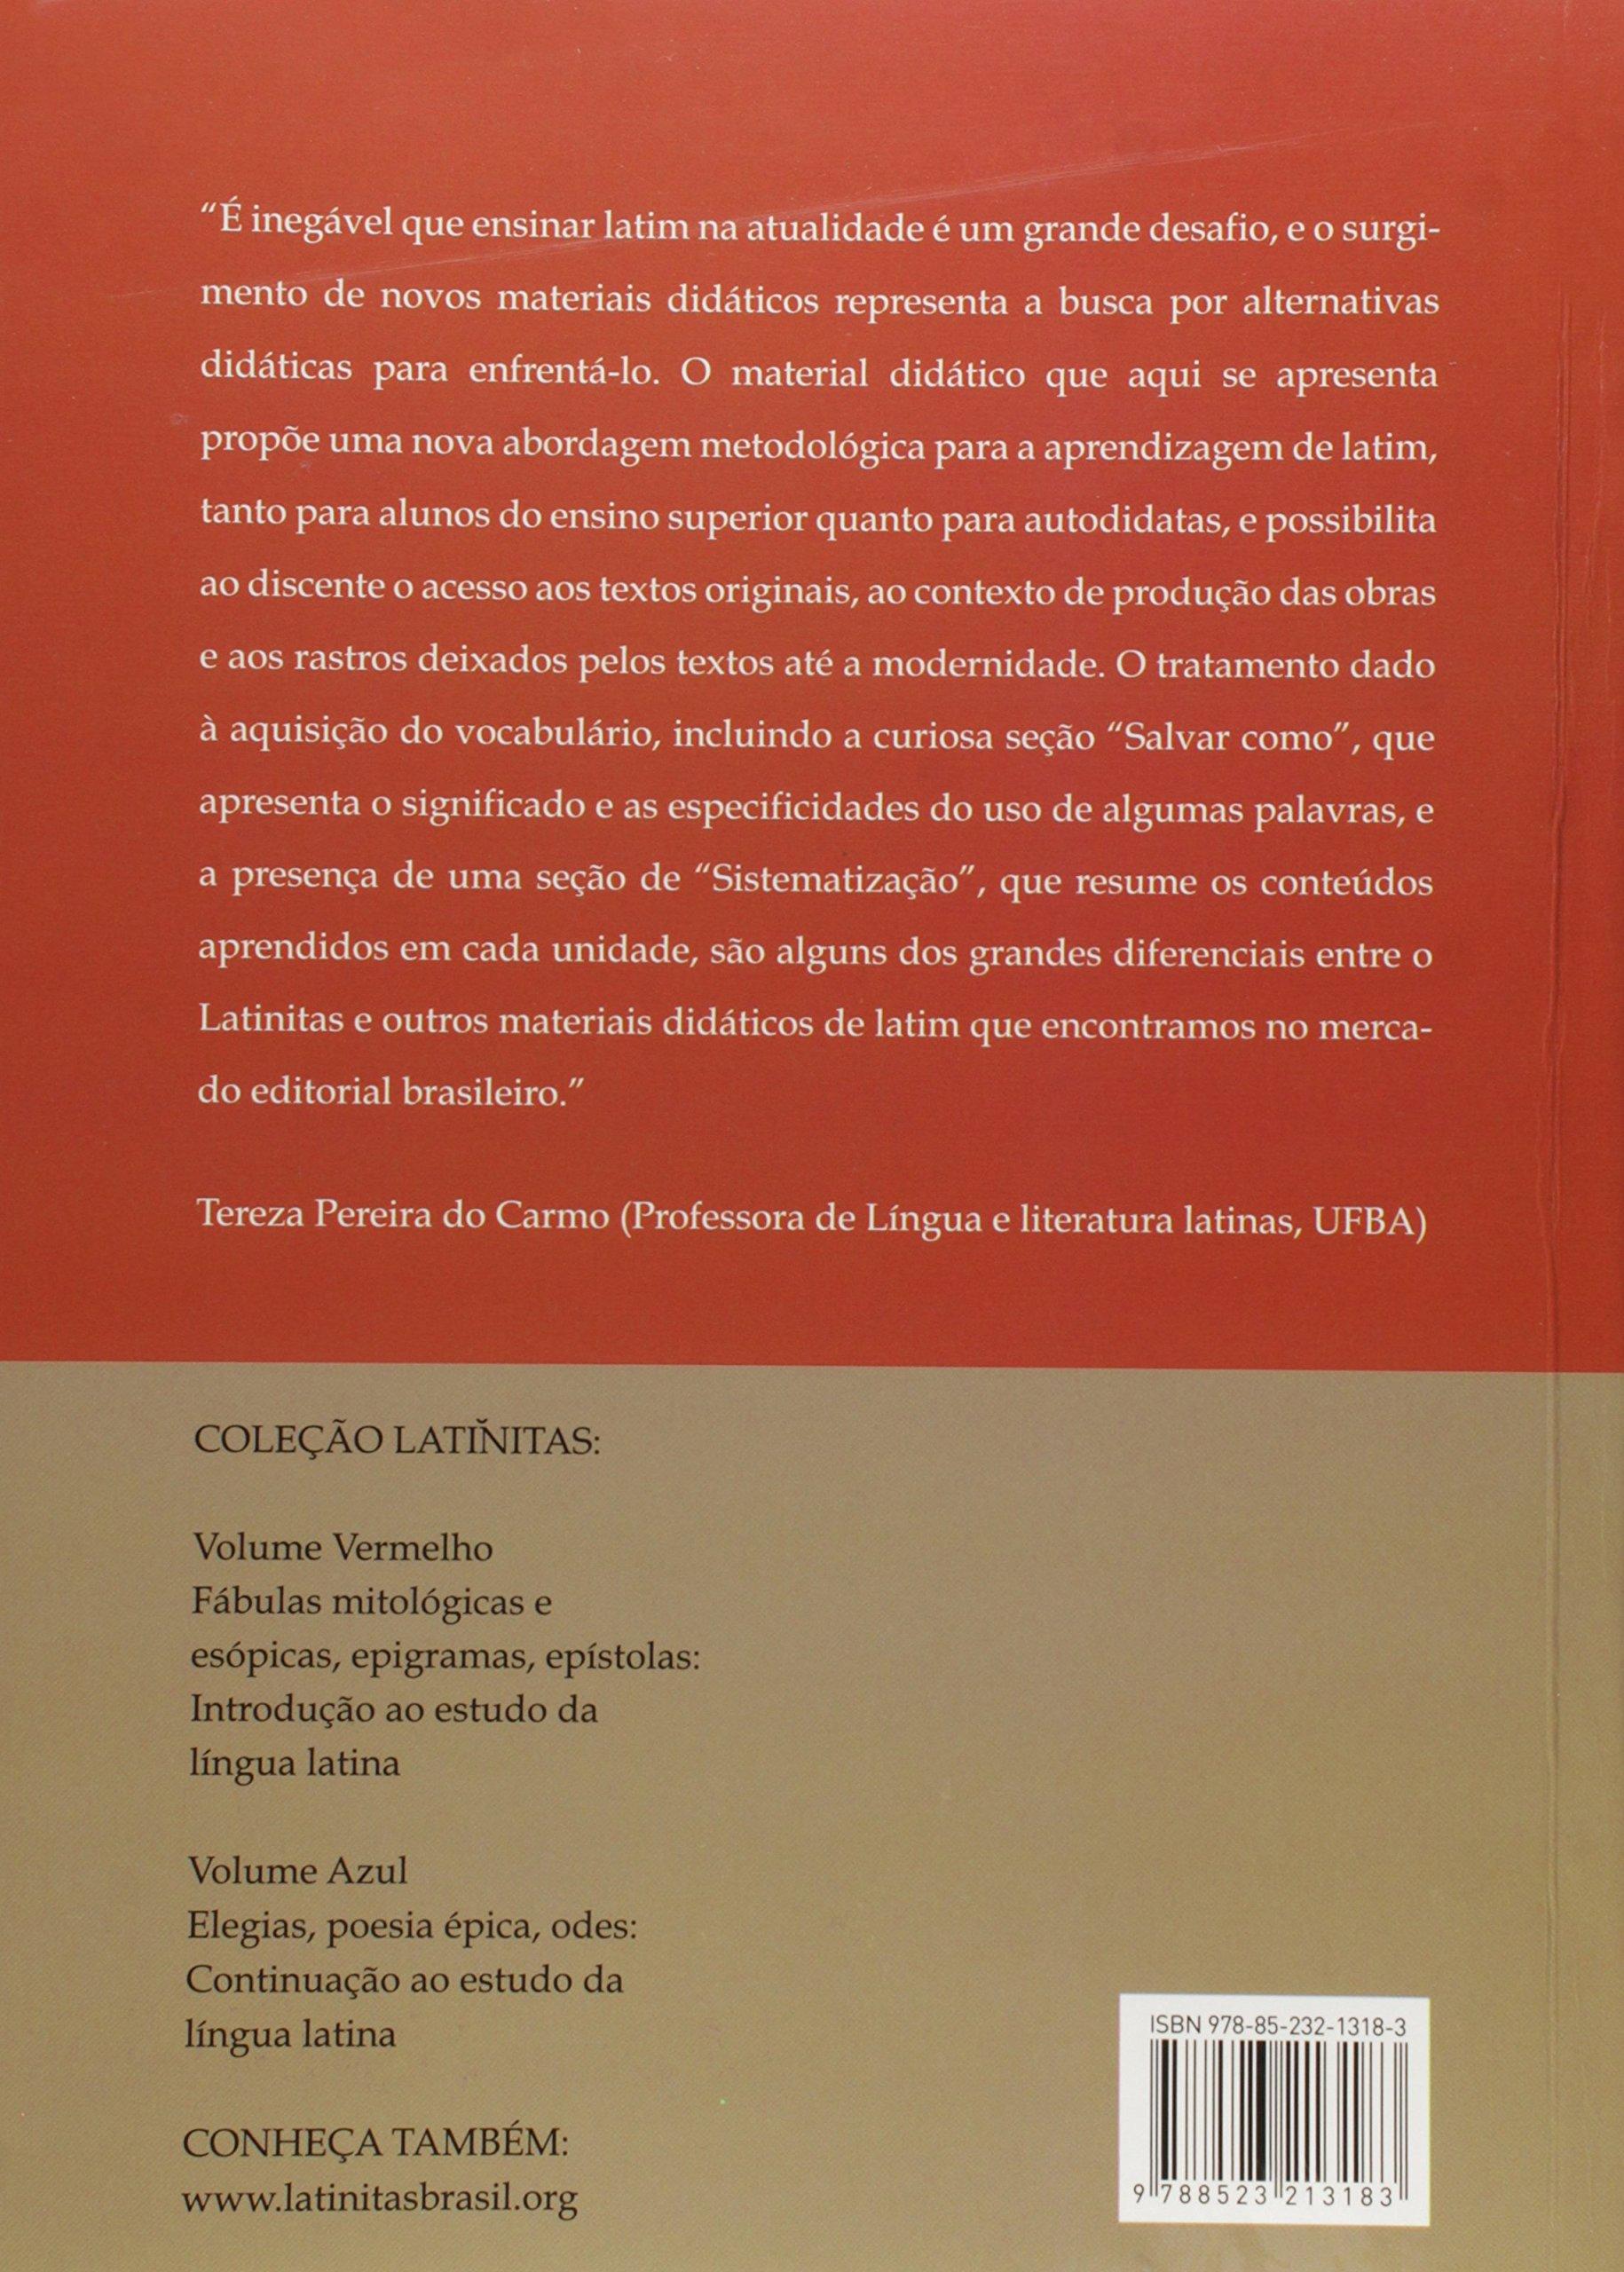 Latinitas. Leituras de Texto em Língua Latina - Volume 1: Amazon.es: José Amarante Santos Sobrinho: Libros